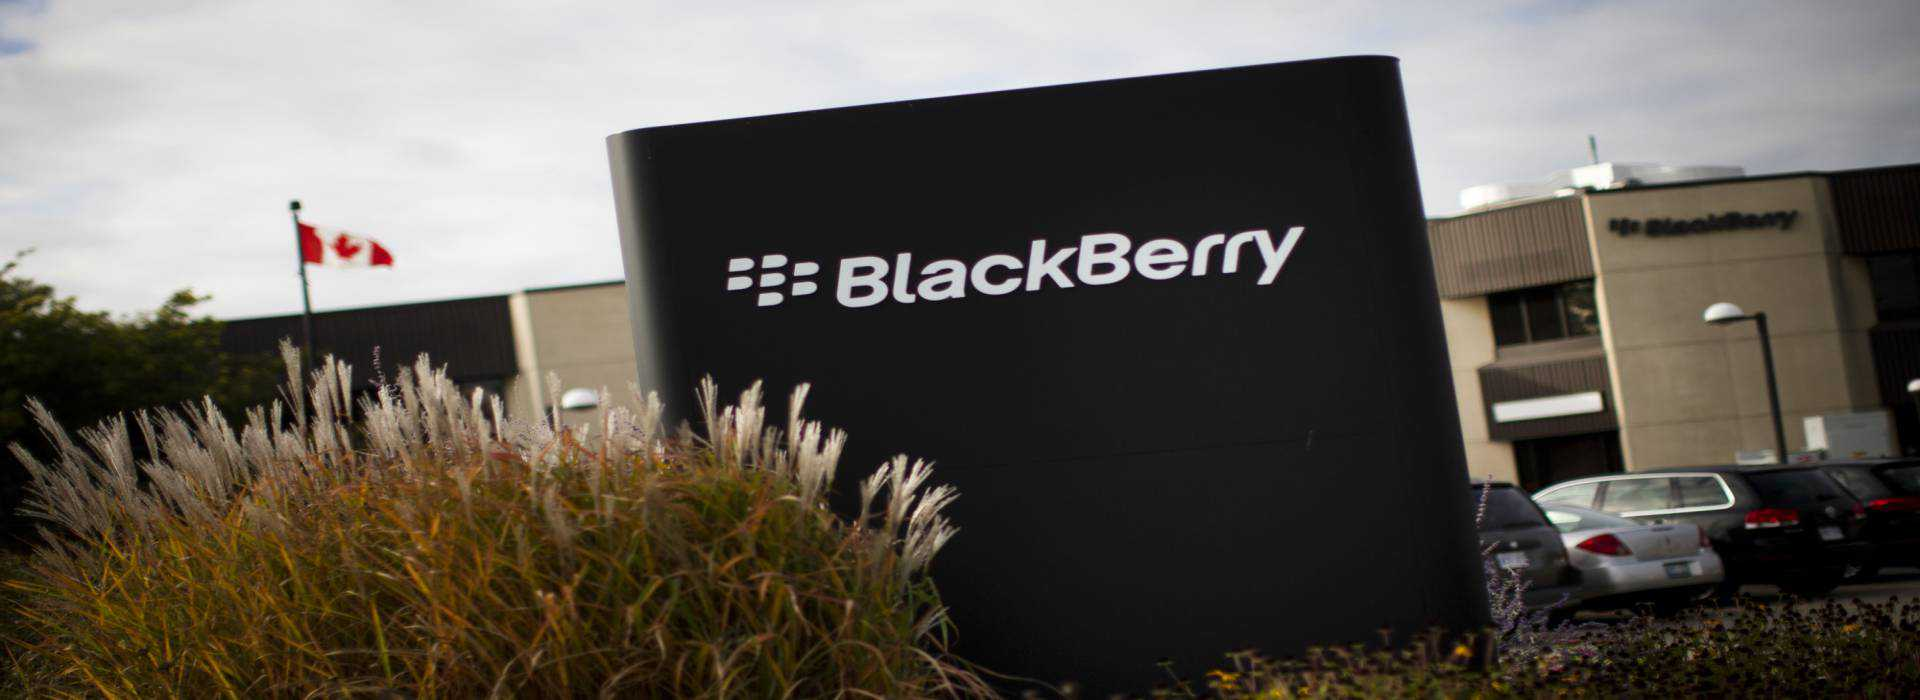 Blackberry Canada Customer Service Number, Head Office